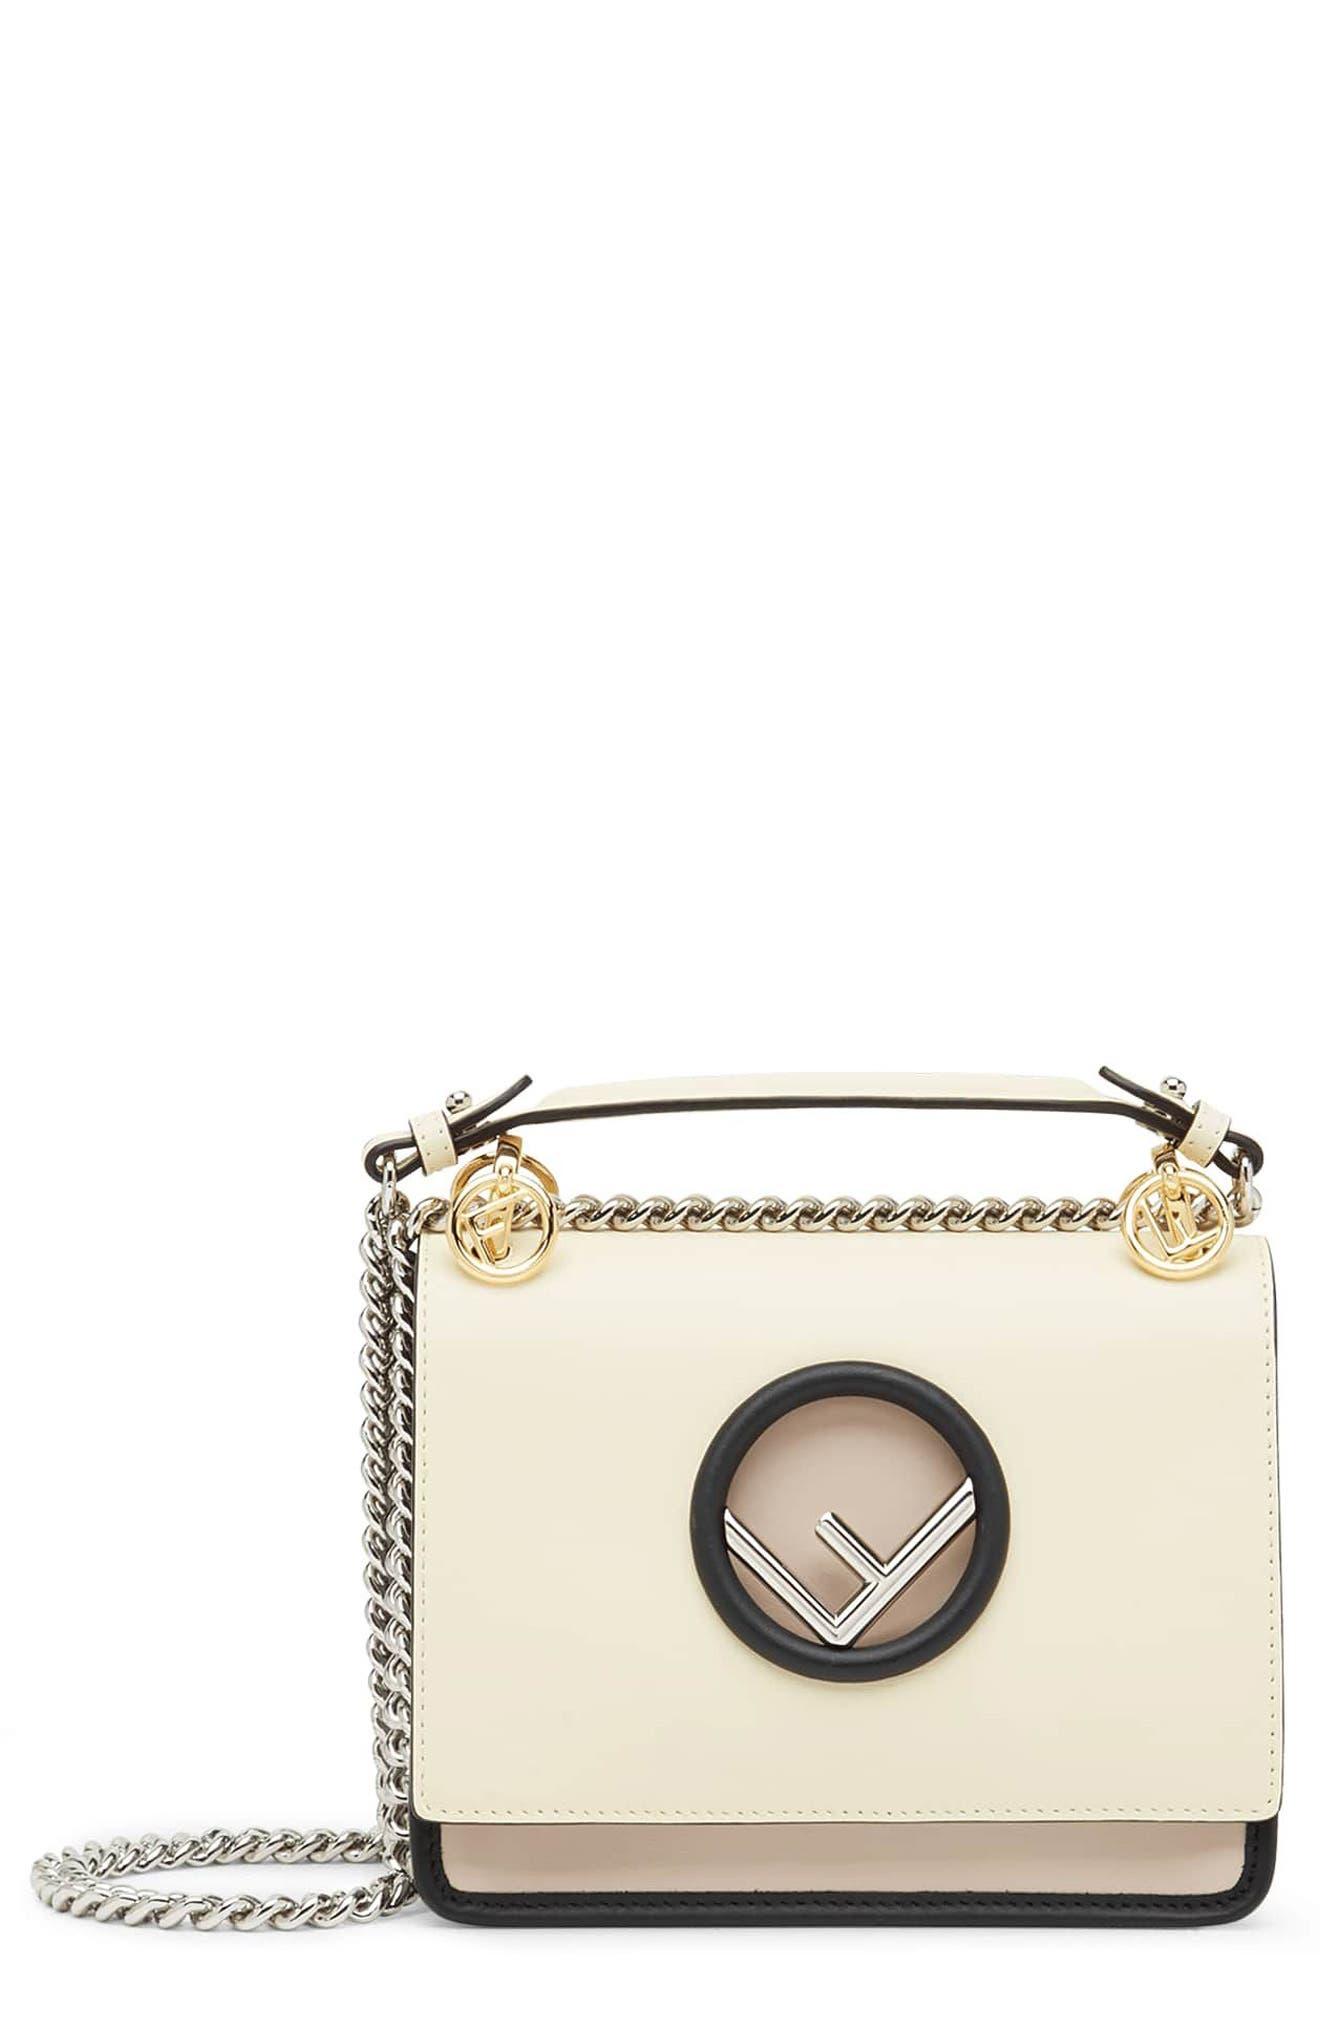 Mini Kan I Colorblock Leather Shoulder Bag,                             Main thumbnail 1, color,                             650